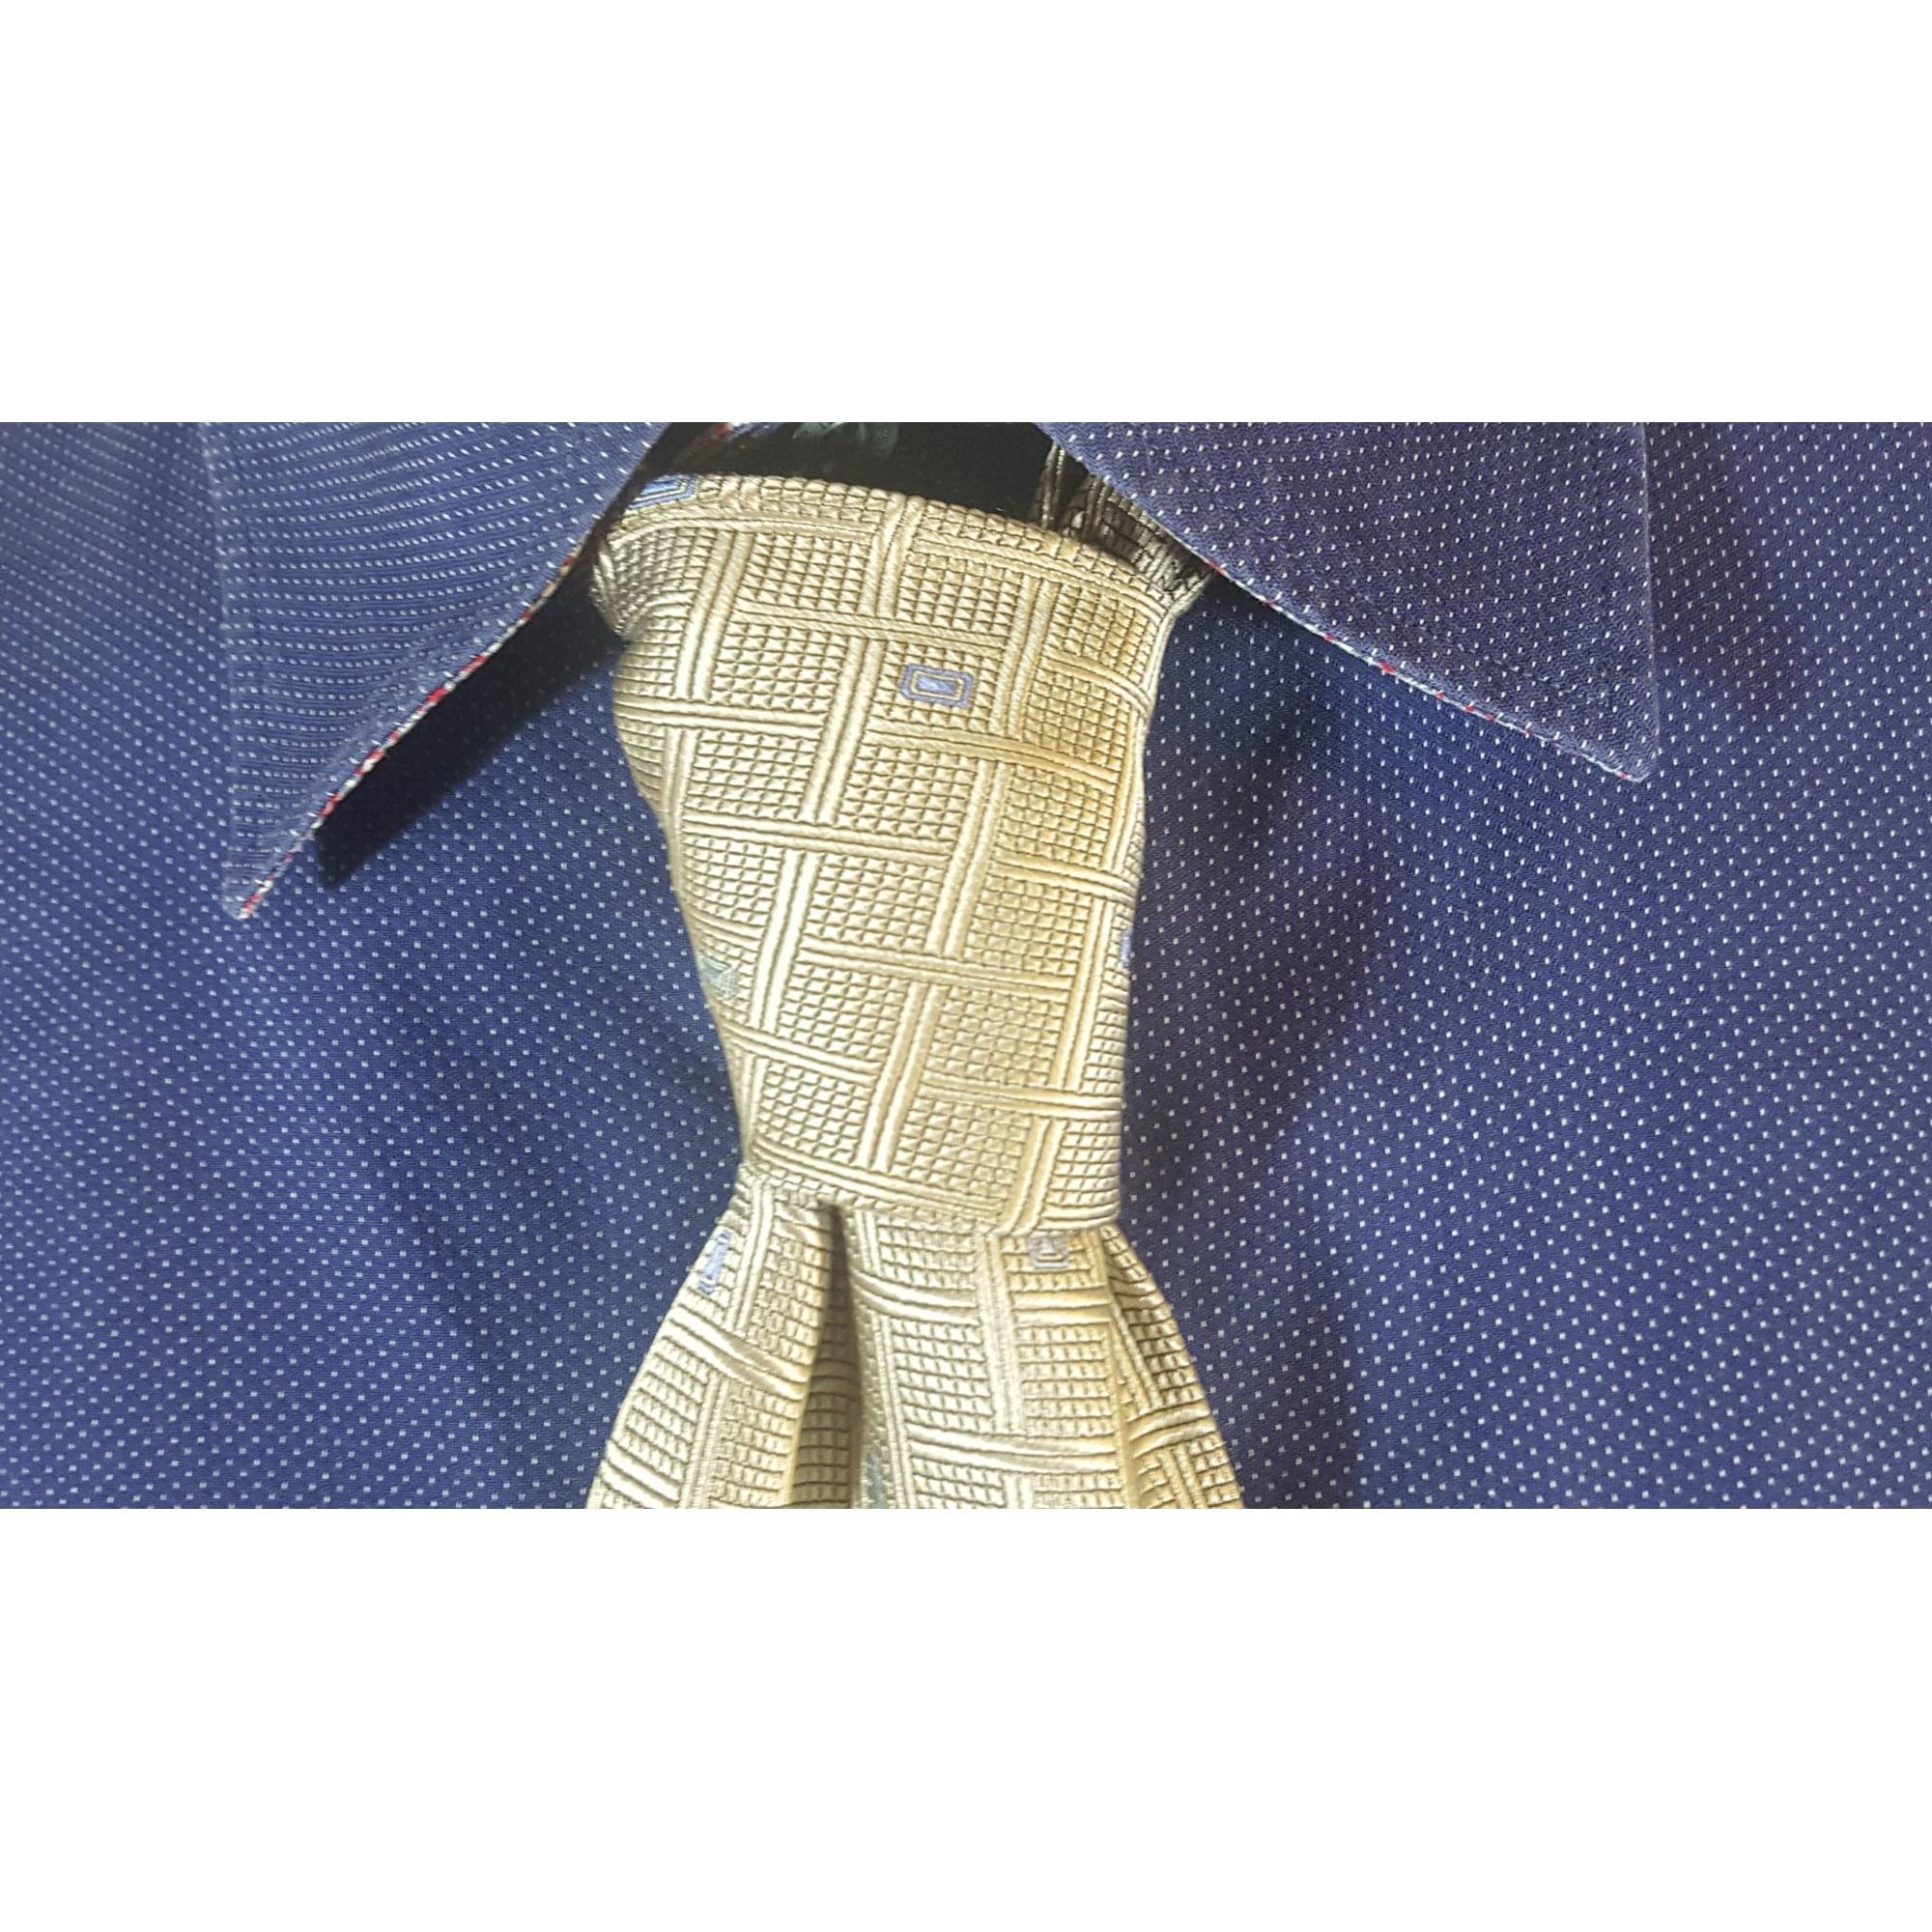 Cravate JEAN LOUIS SCHERRER Gris, anthracite